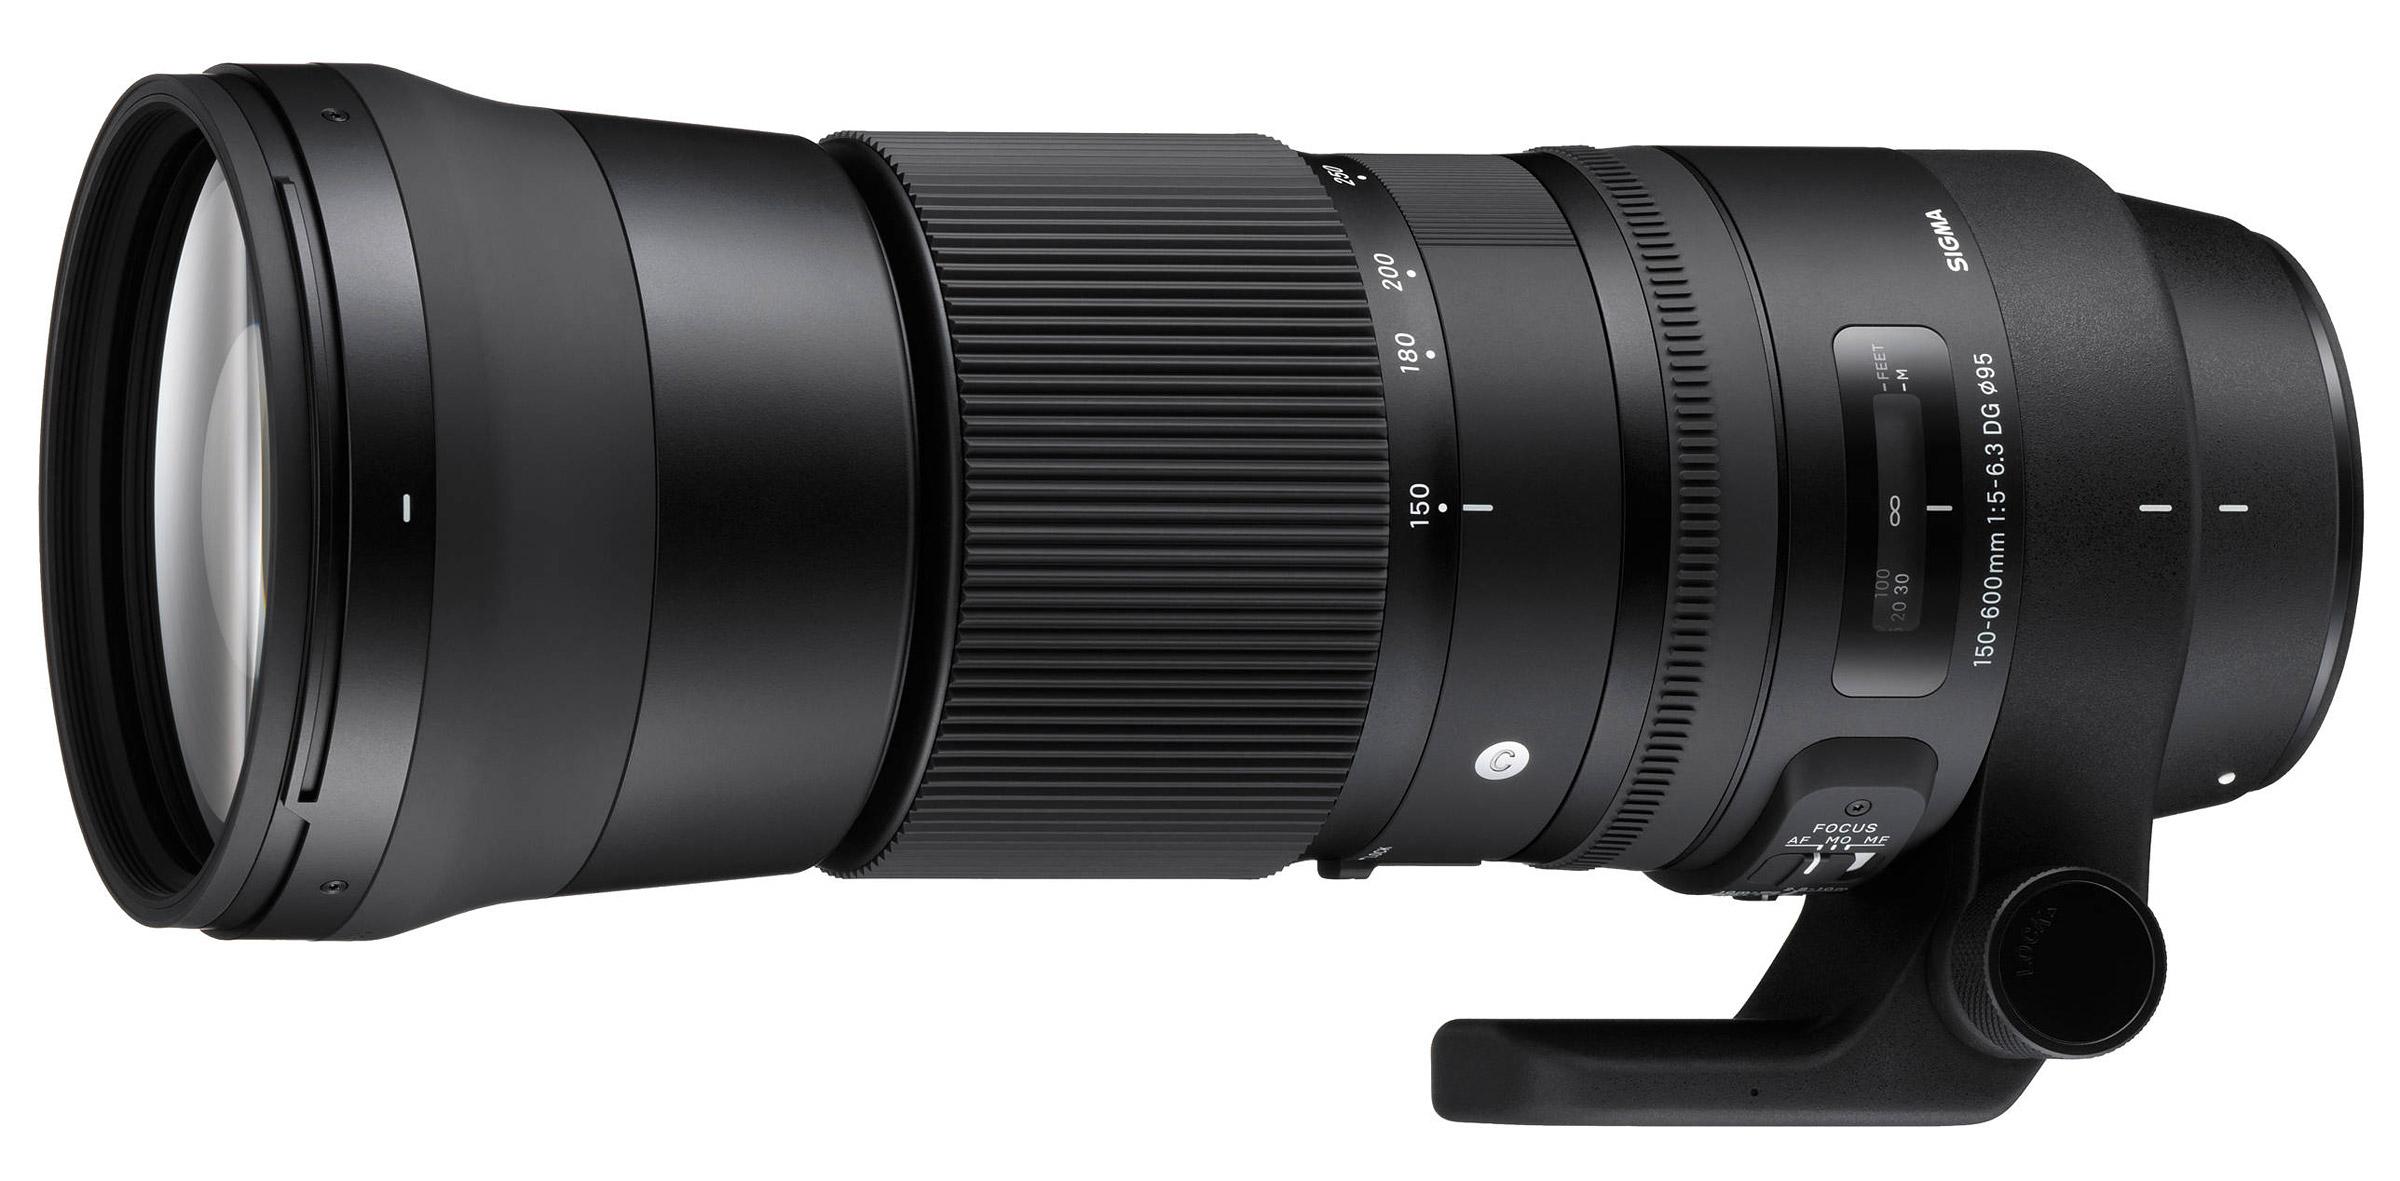 Sigma 150-600mm f/5-6.3 DG OS HSM C